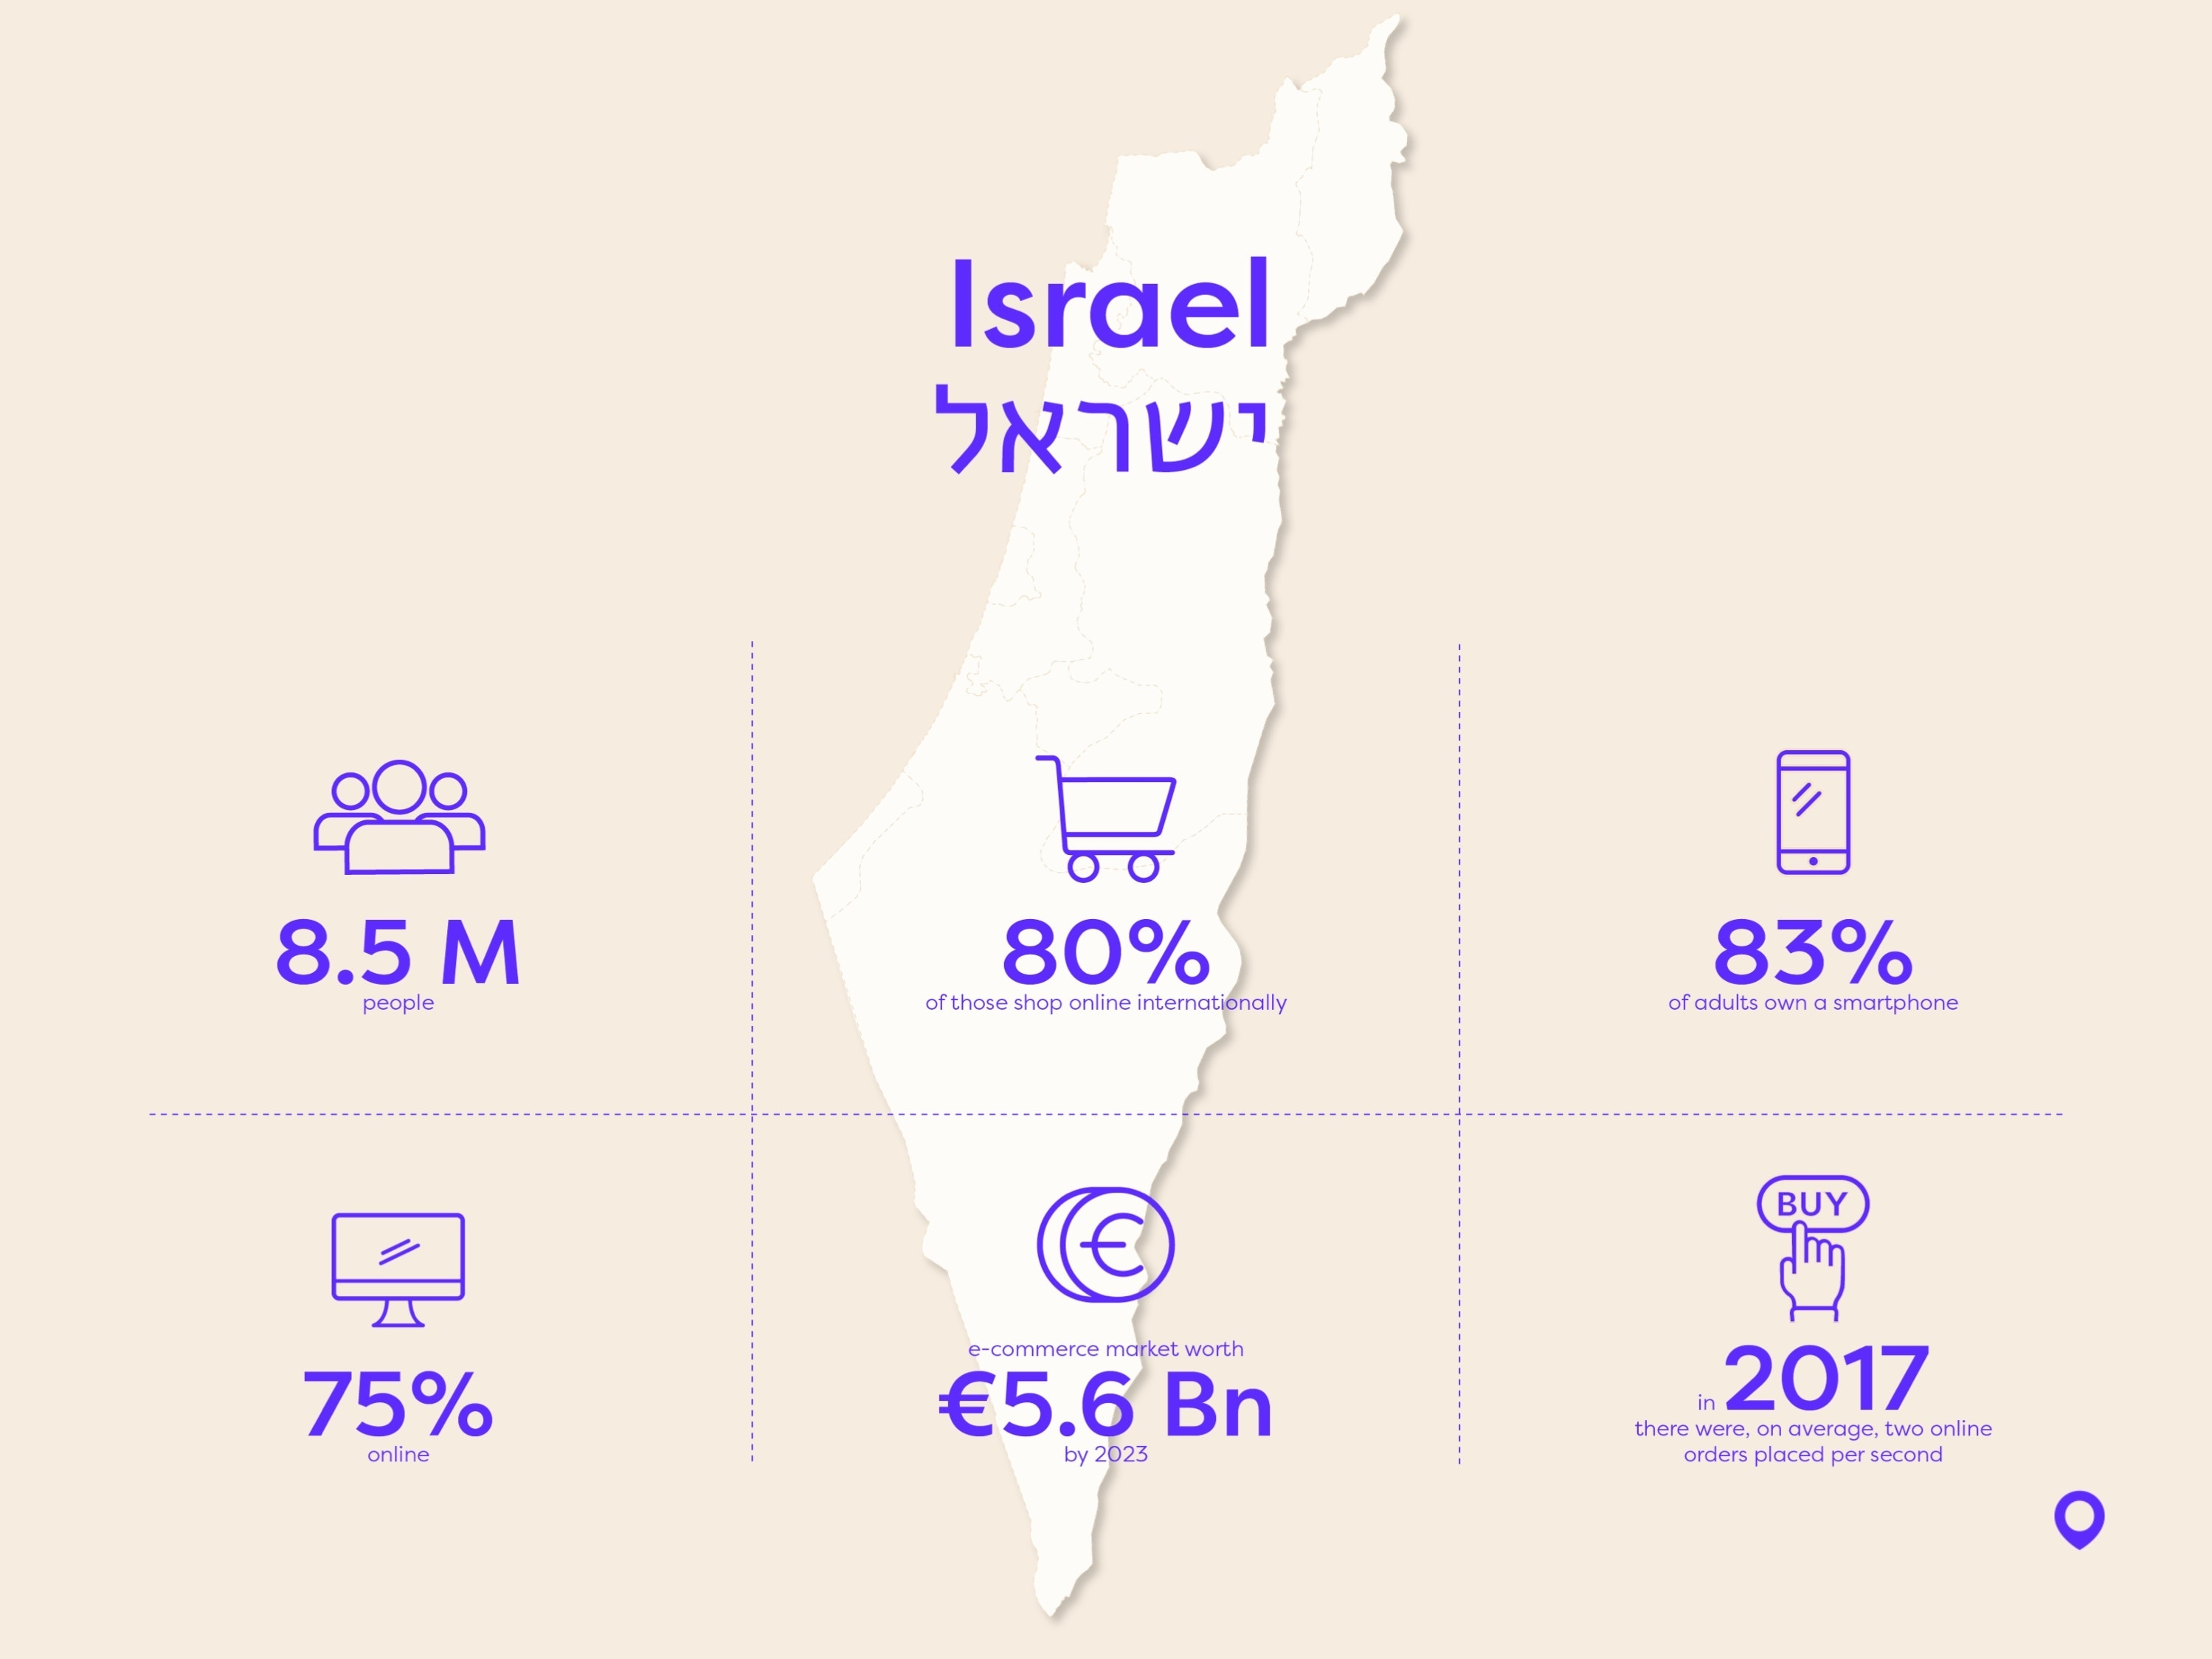 israel stats